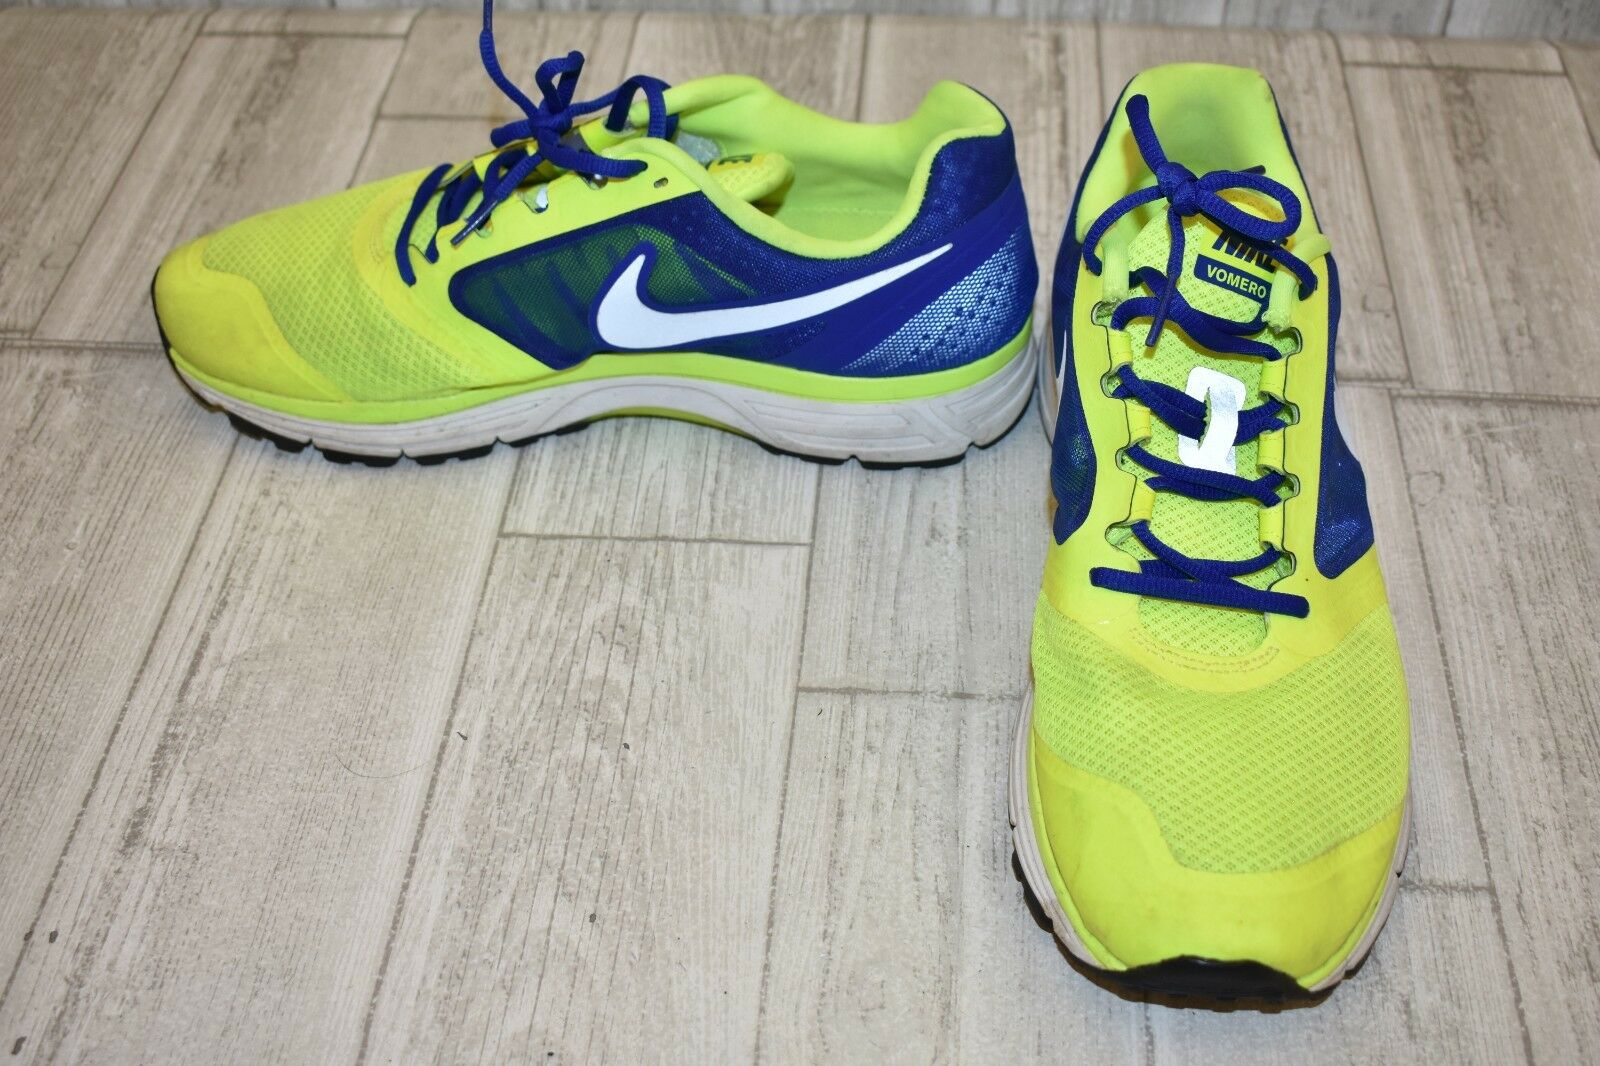 Nike Air Zoom Vomero 8 Uomo   Da Corsa, Uomo 8 Numero 12, Giallo / Blu 78d841